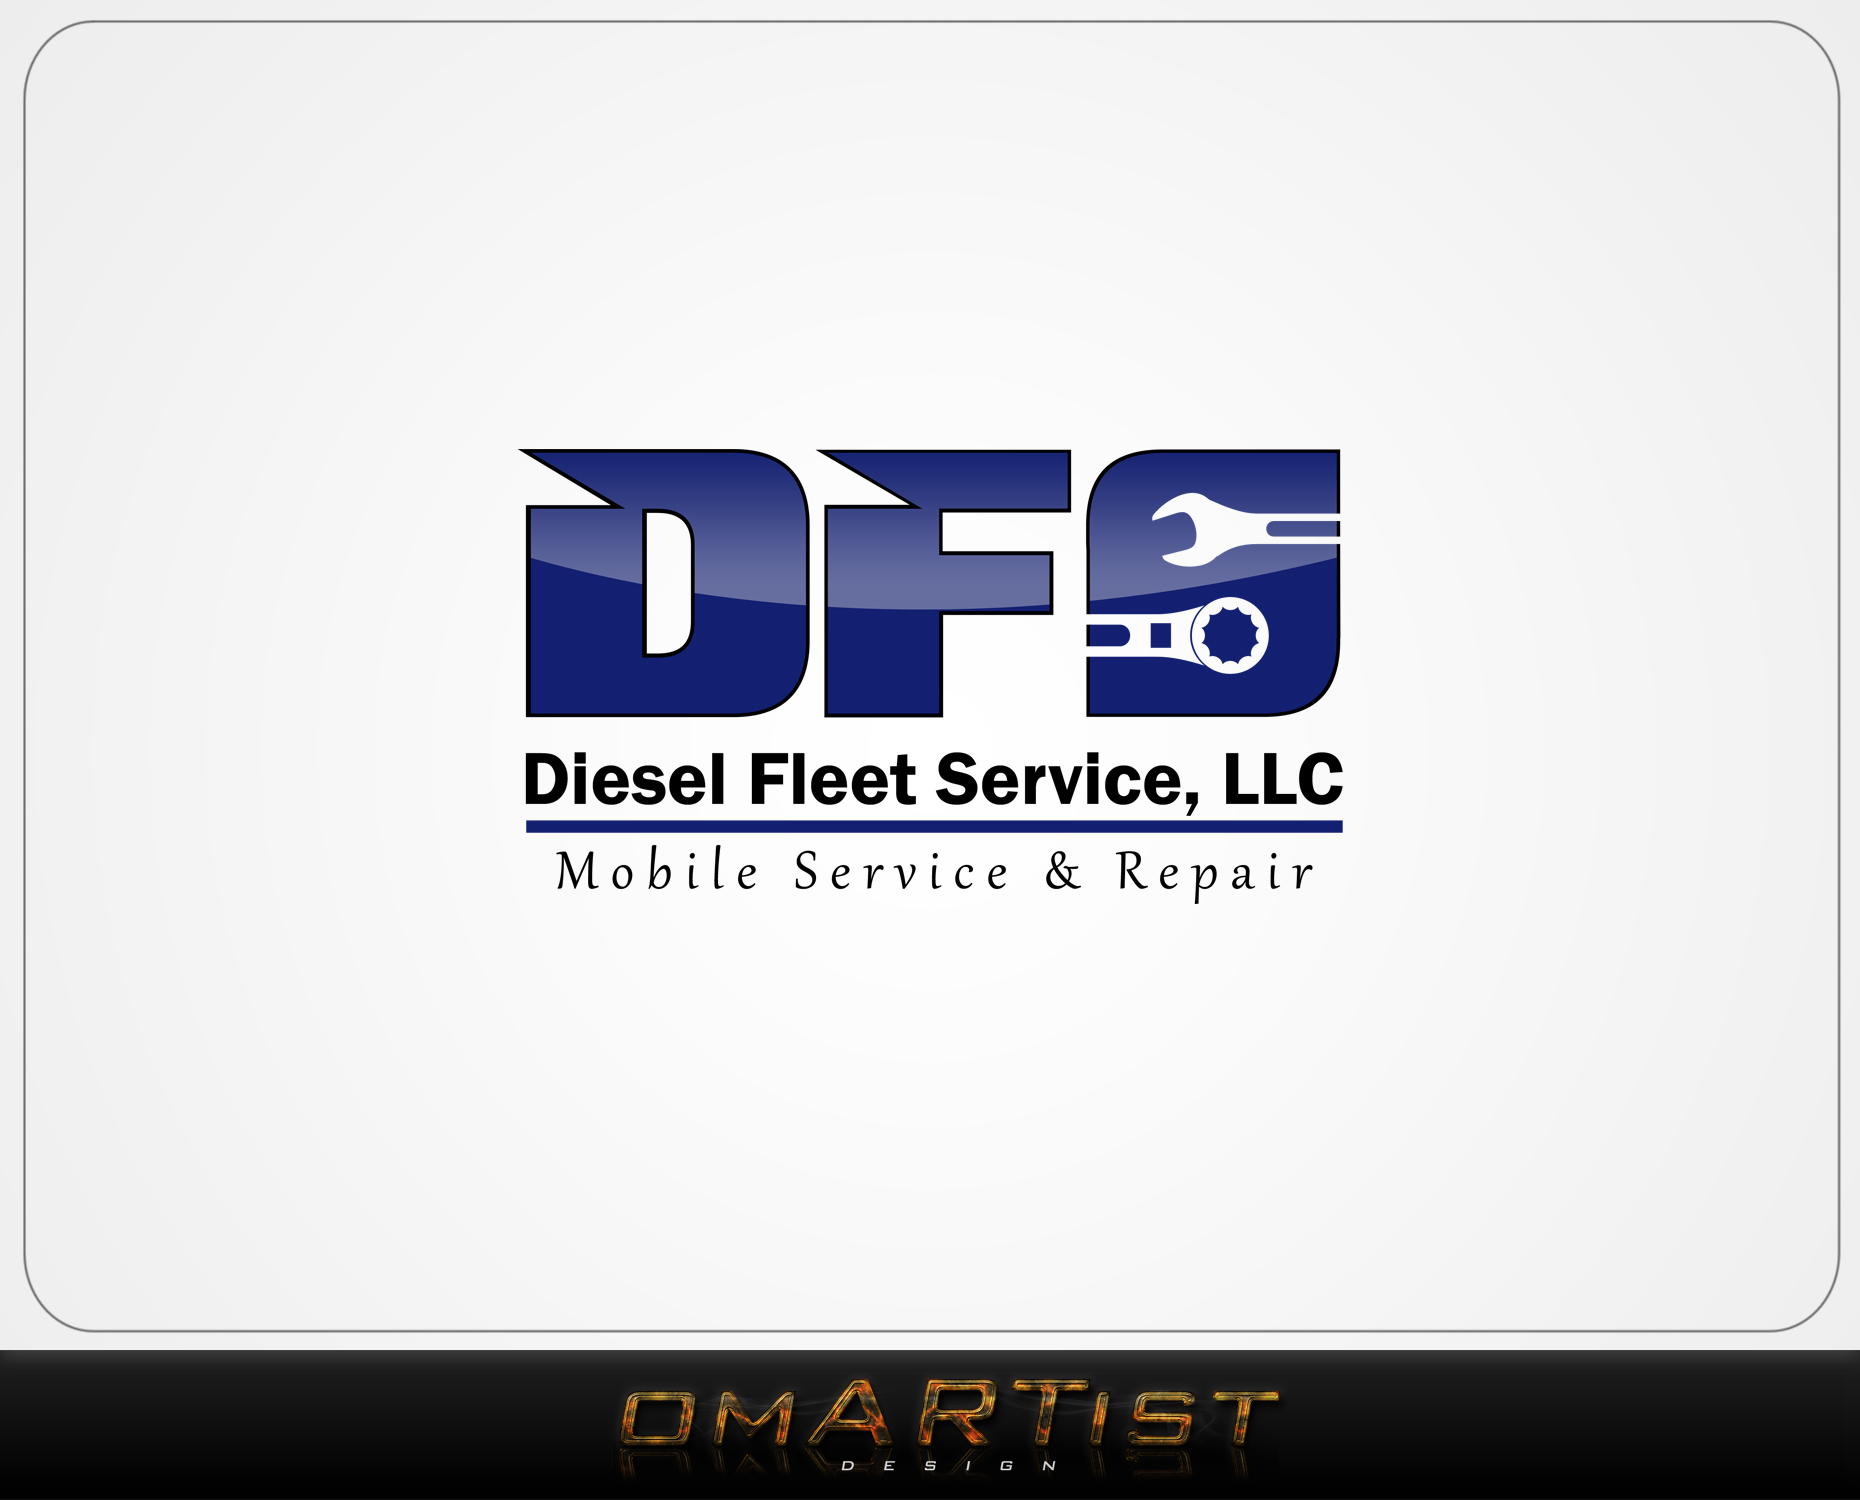 Logo Design by omARTist - Entry No. 28 in the Logo Design Contest Artistic Logo Design for Diesel Fleet Service, LLC.